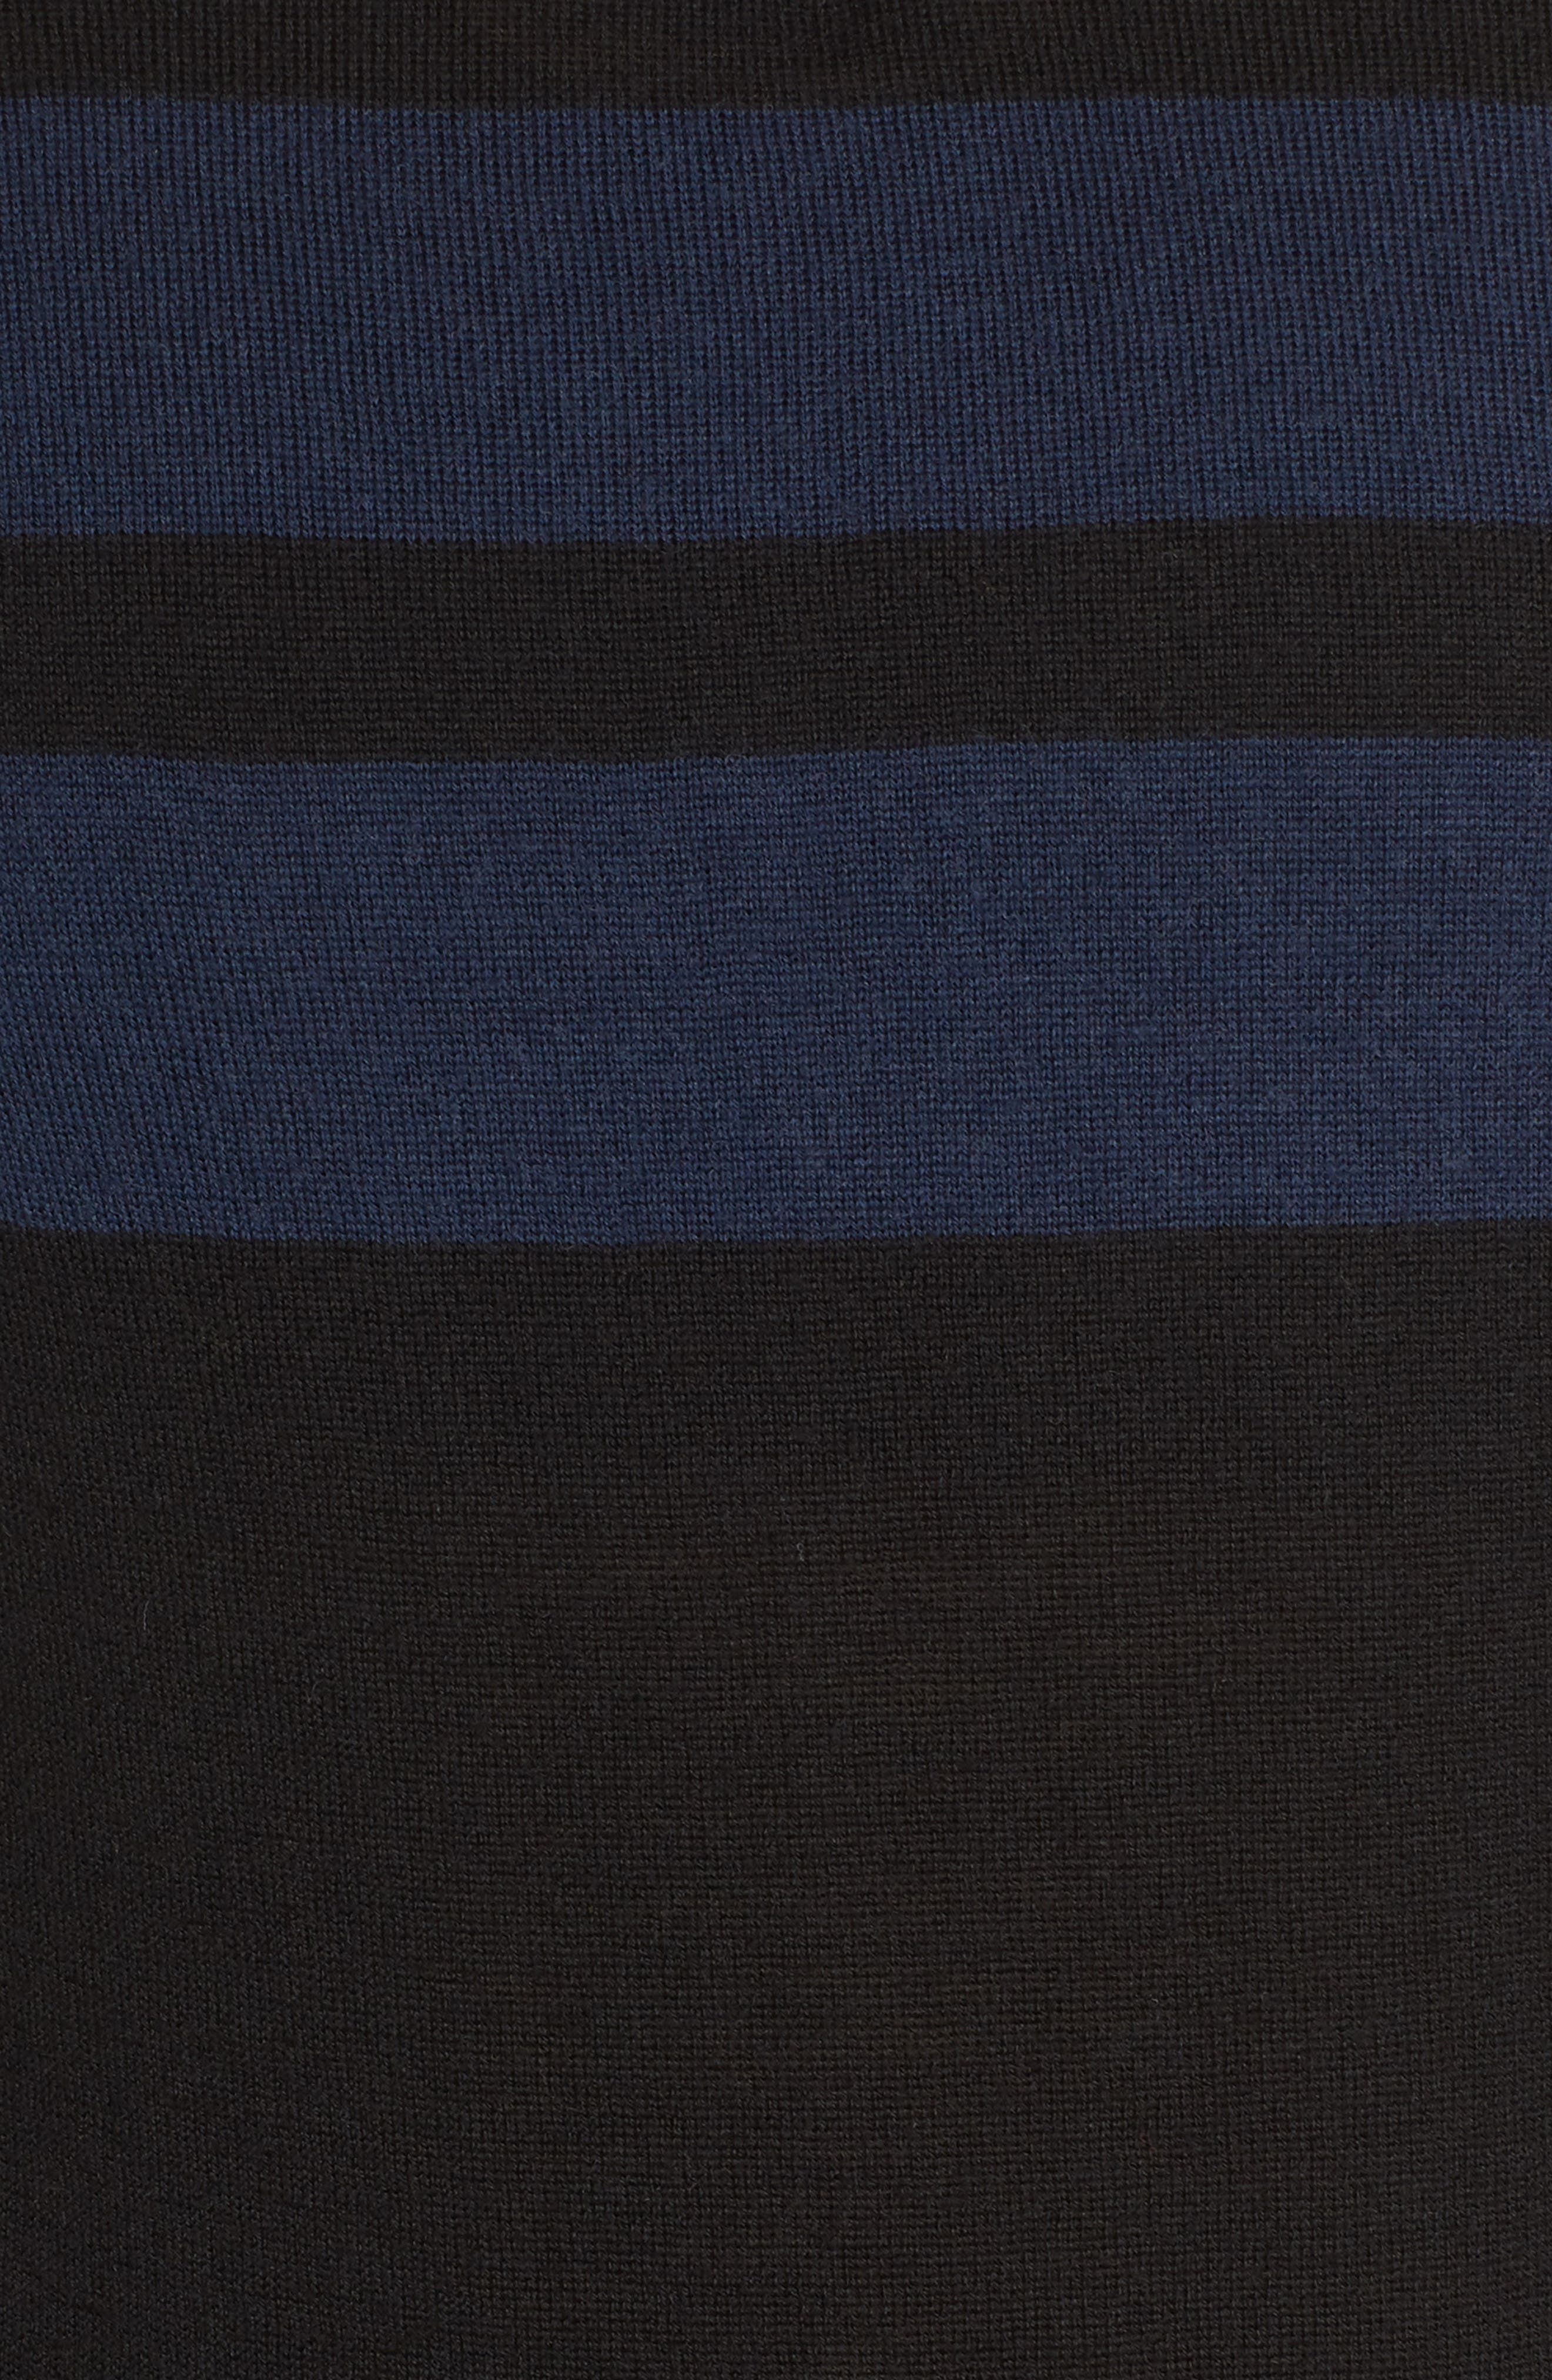 Merino Quarter-Zip Top,                             Alternate thumbnail 6, color,                             001